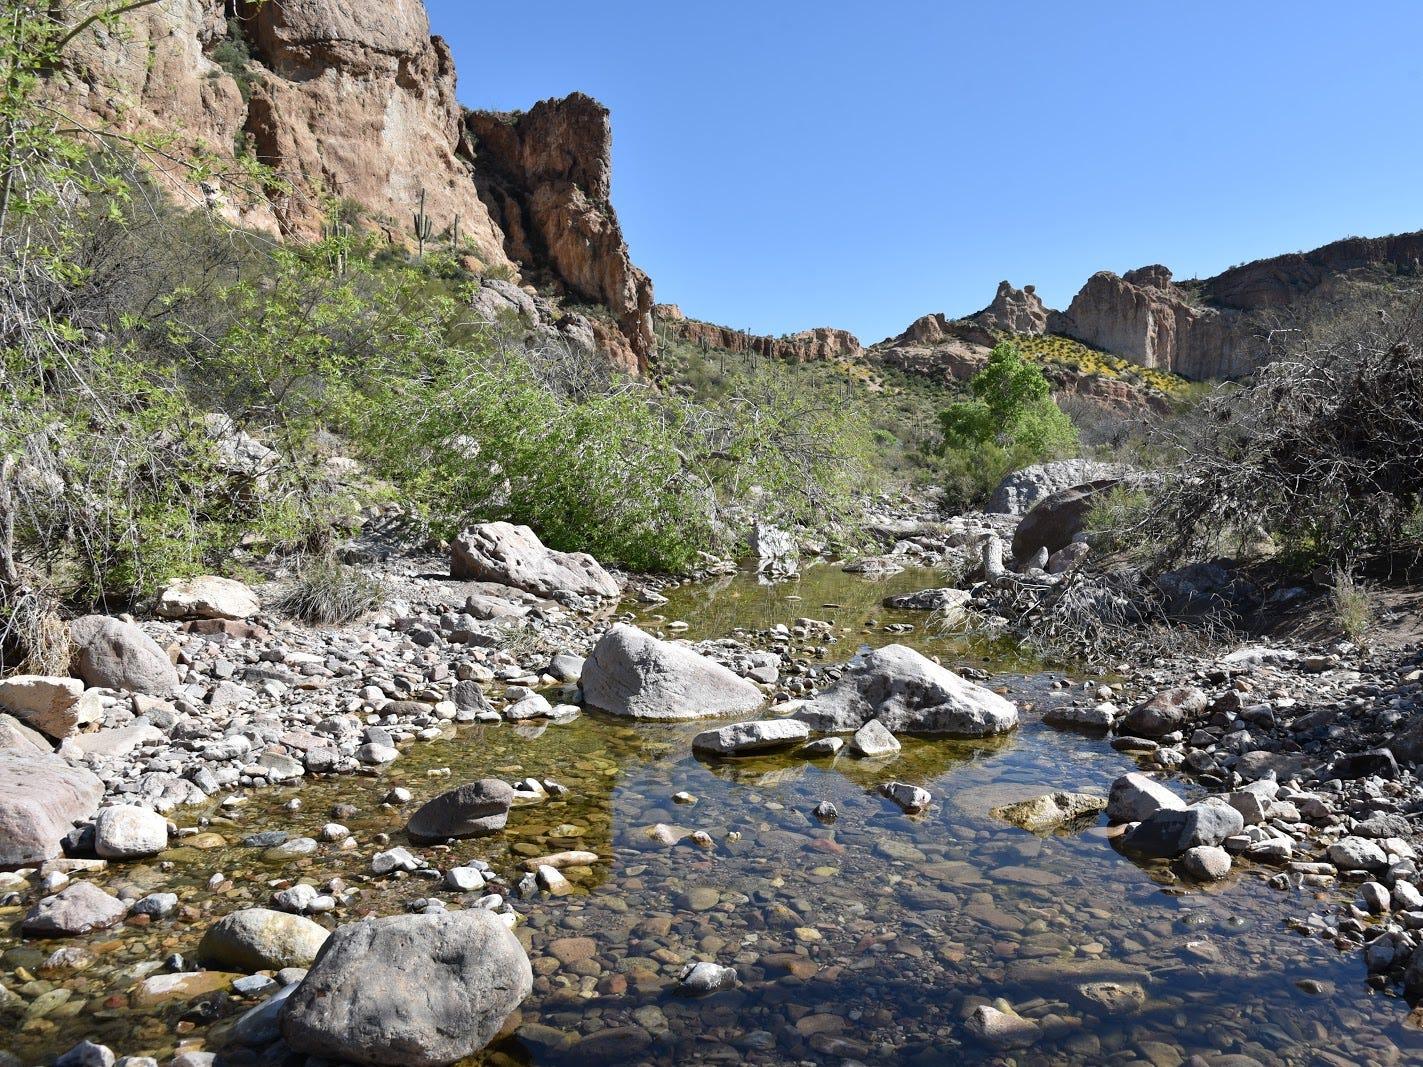 Arnett Creek flows through volcanic terrain.